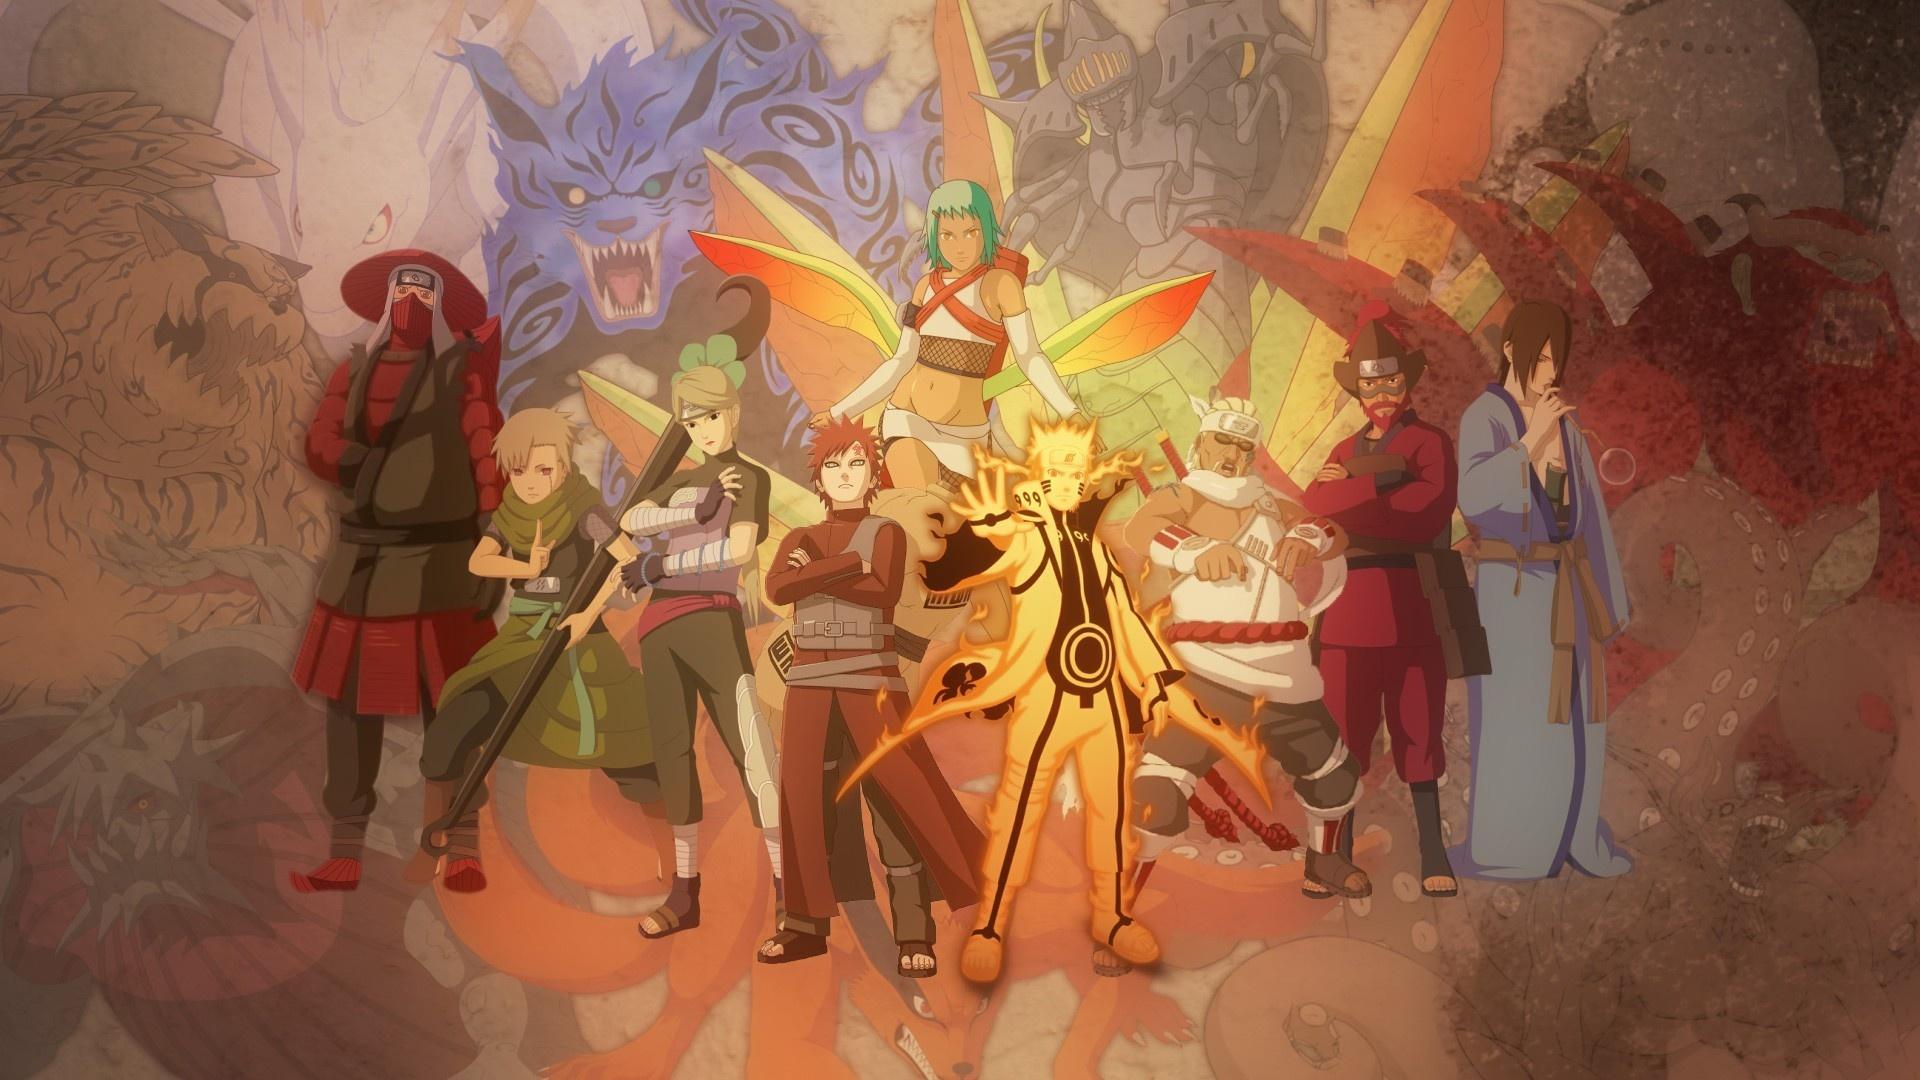 Naruto free image